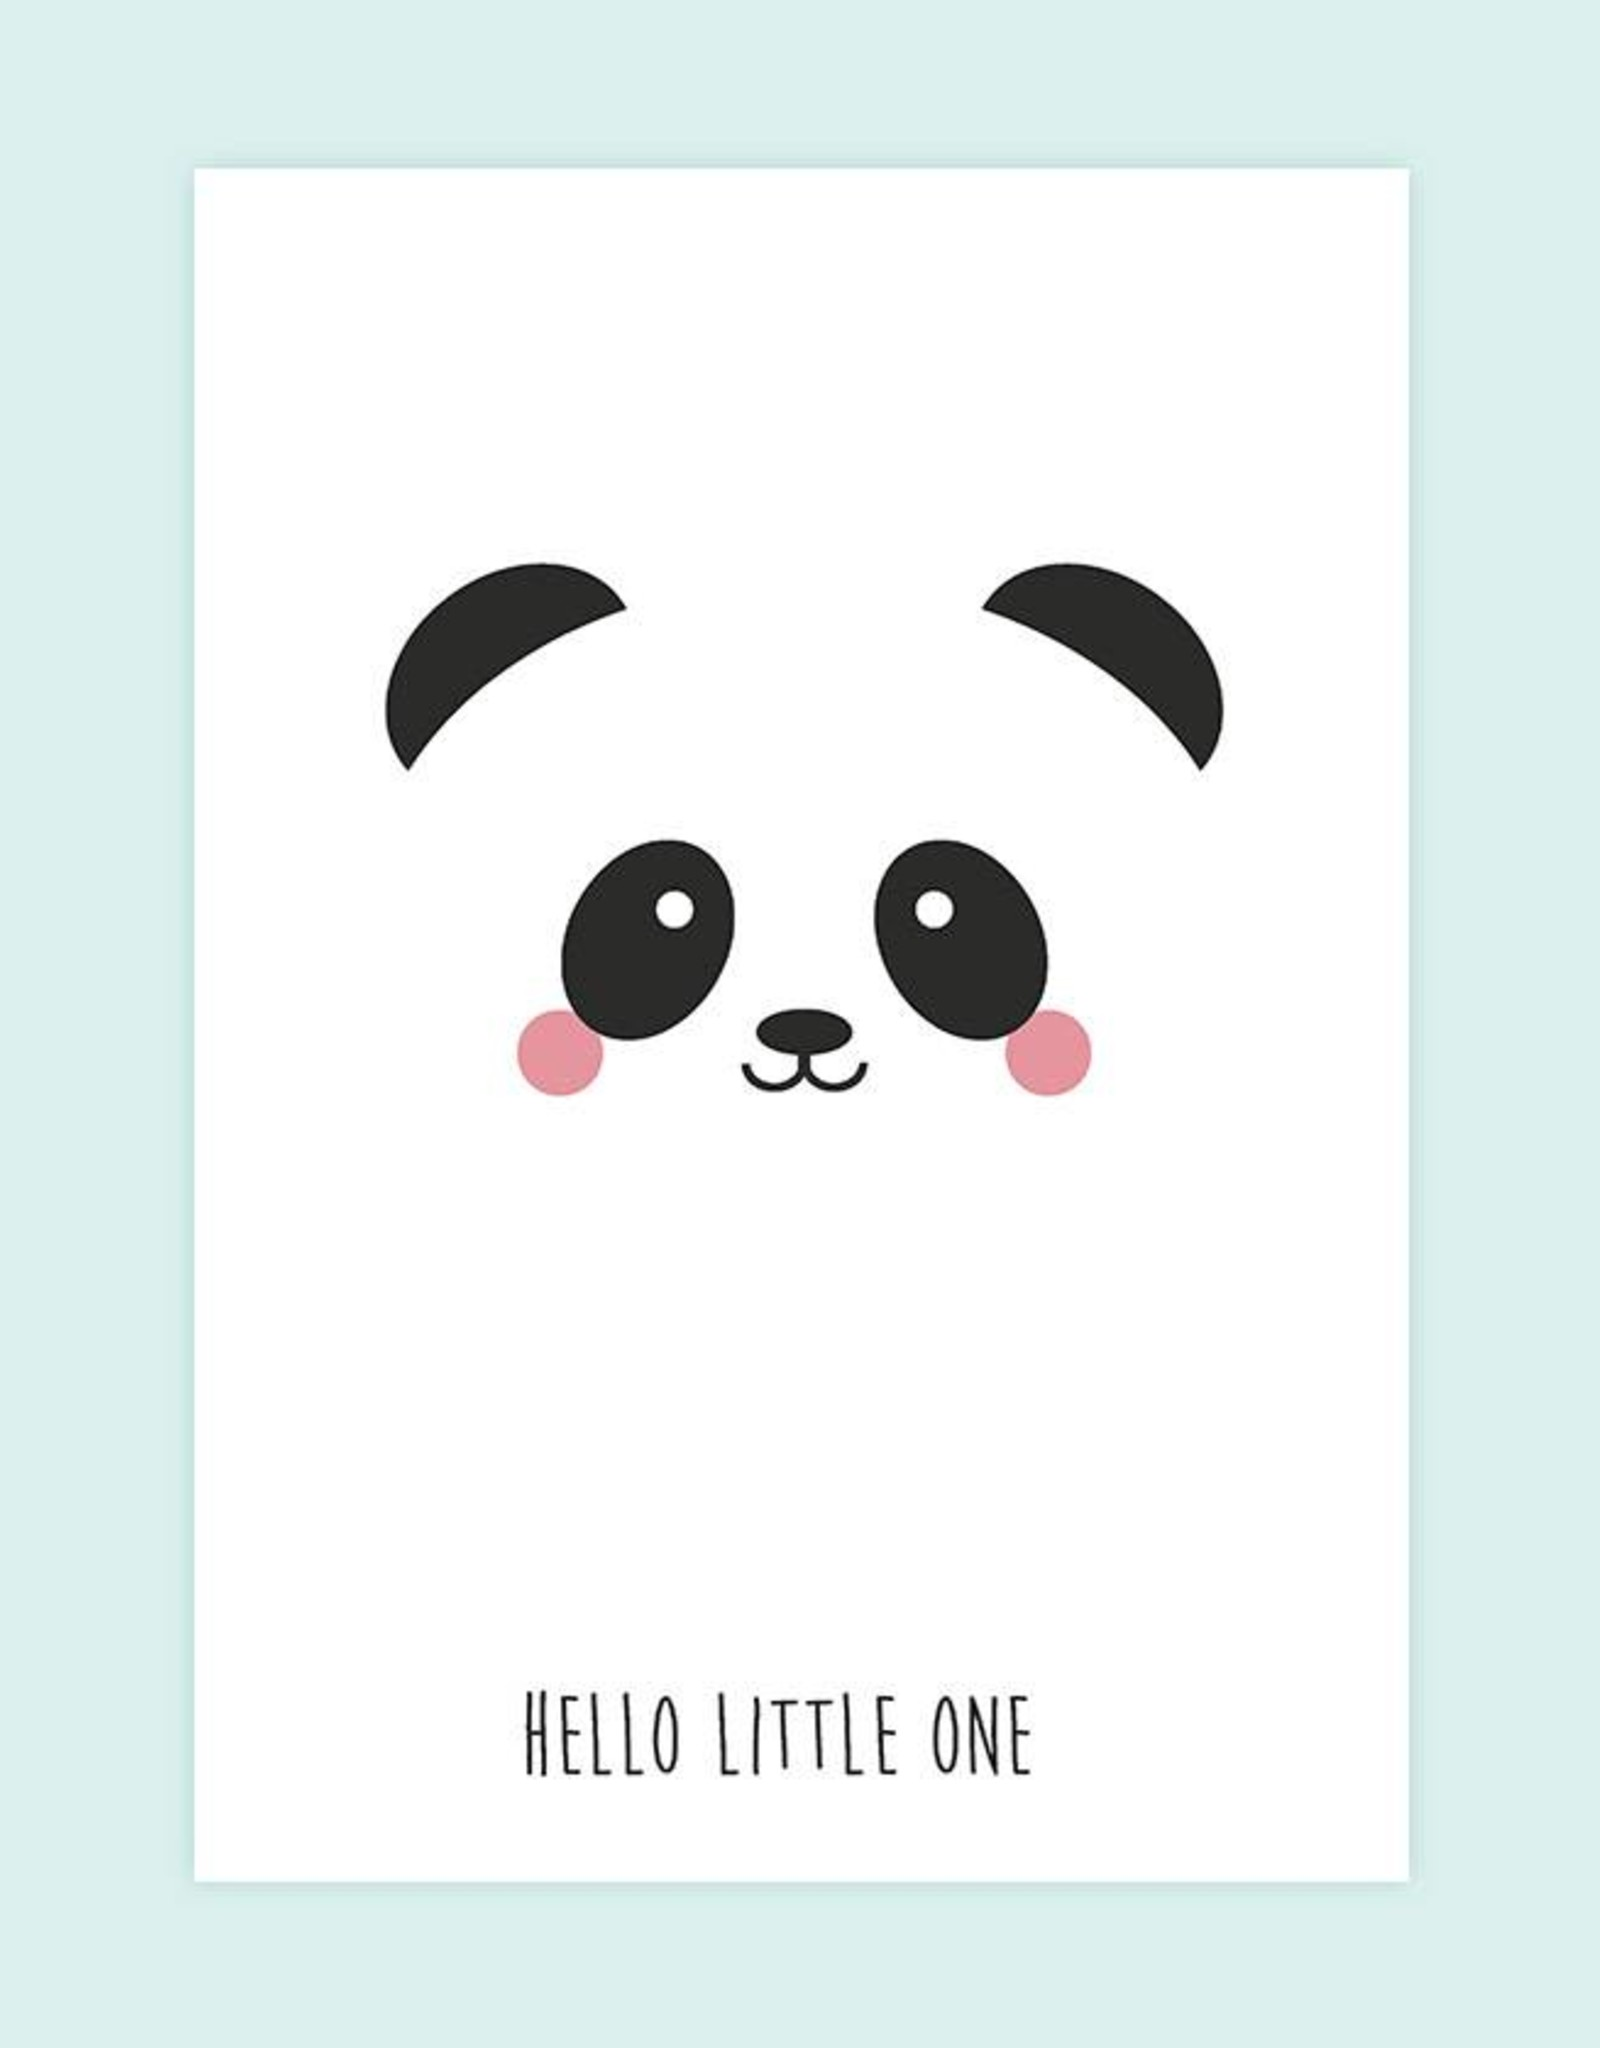 Wenskaart Studio Inktvis-Panda Hello little one